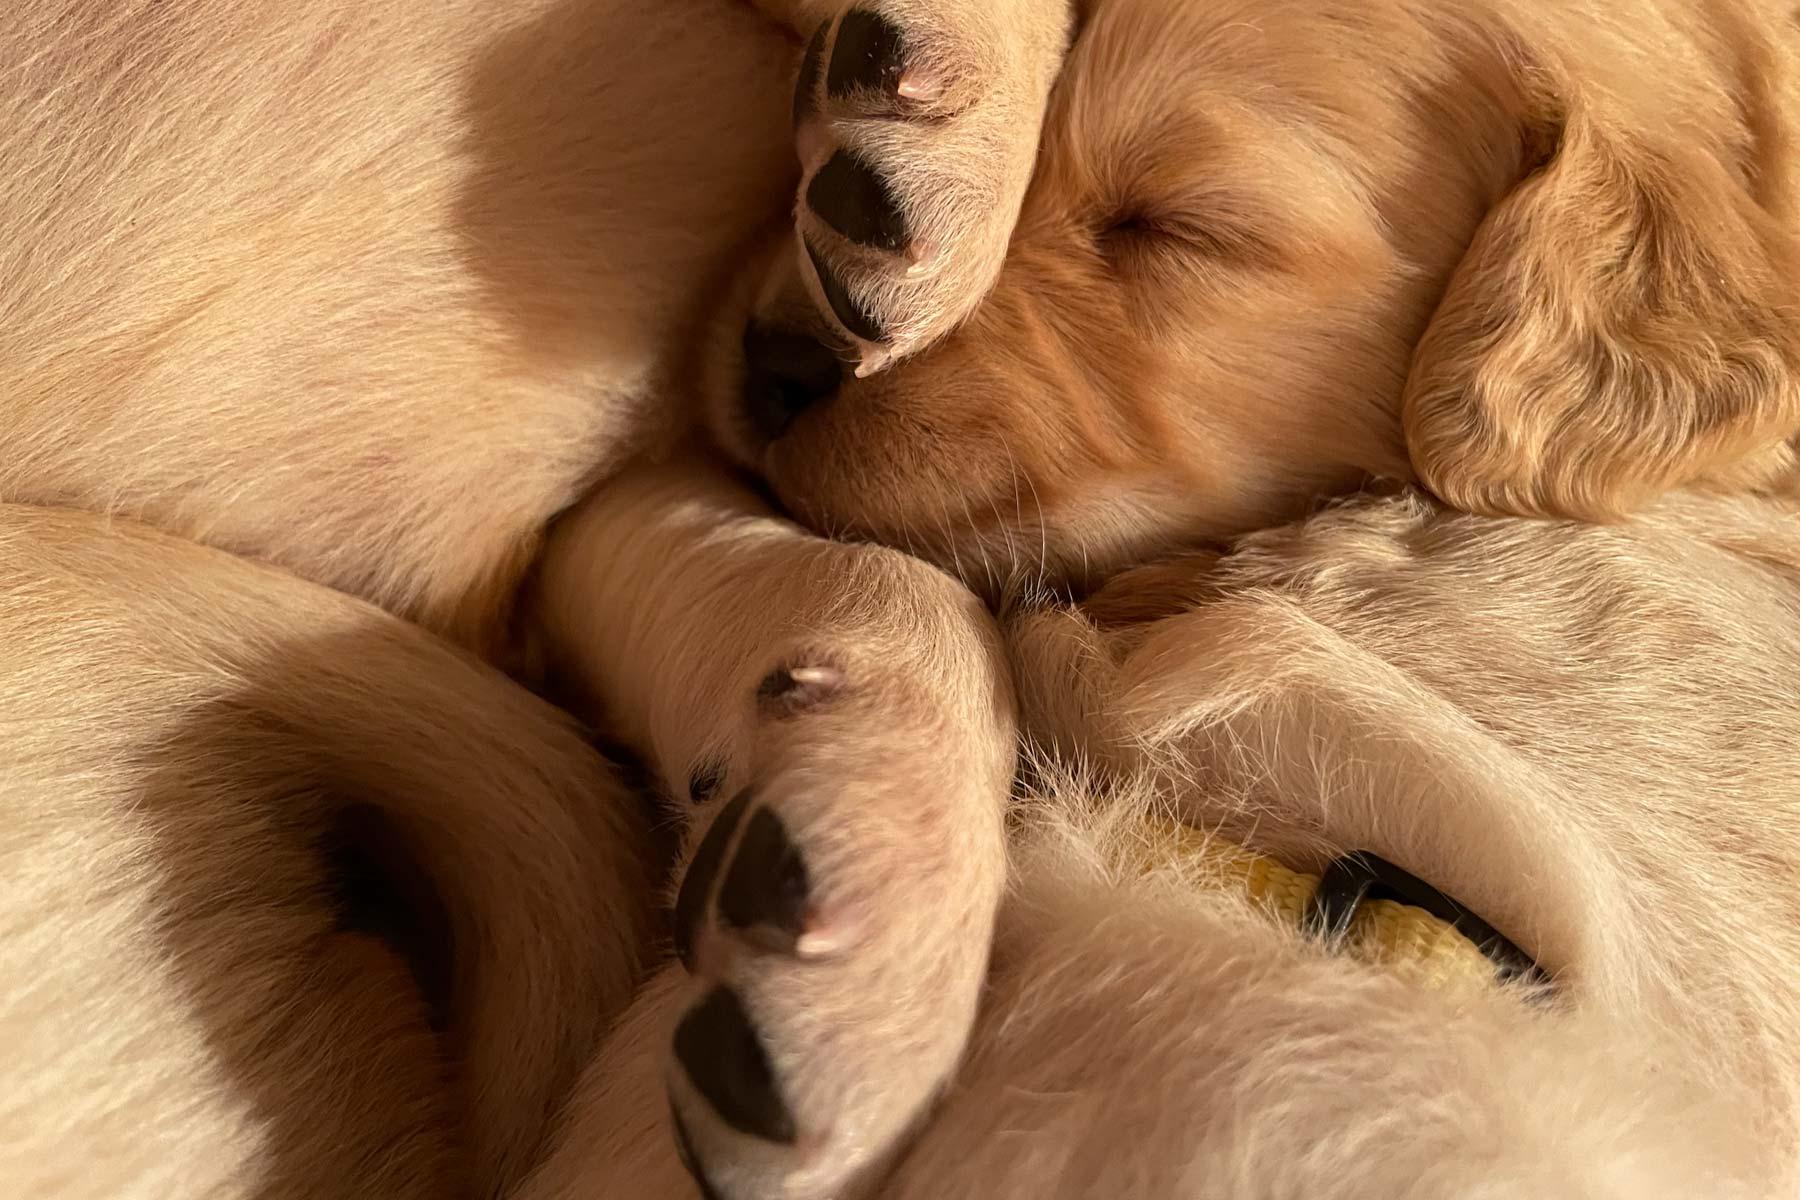 Moose Golden Retrievers Puppy Pile